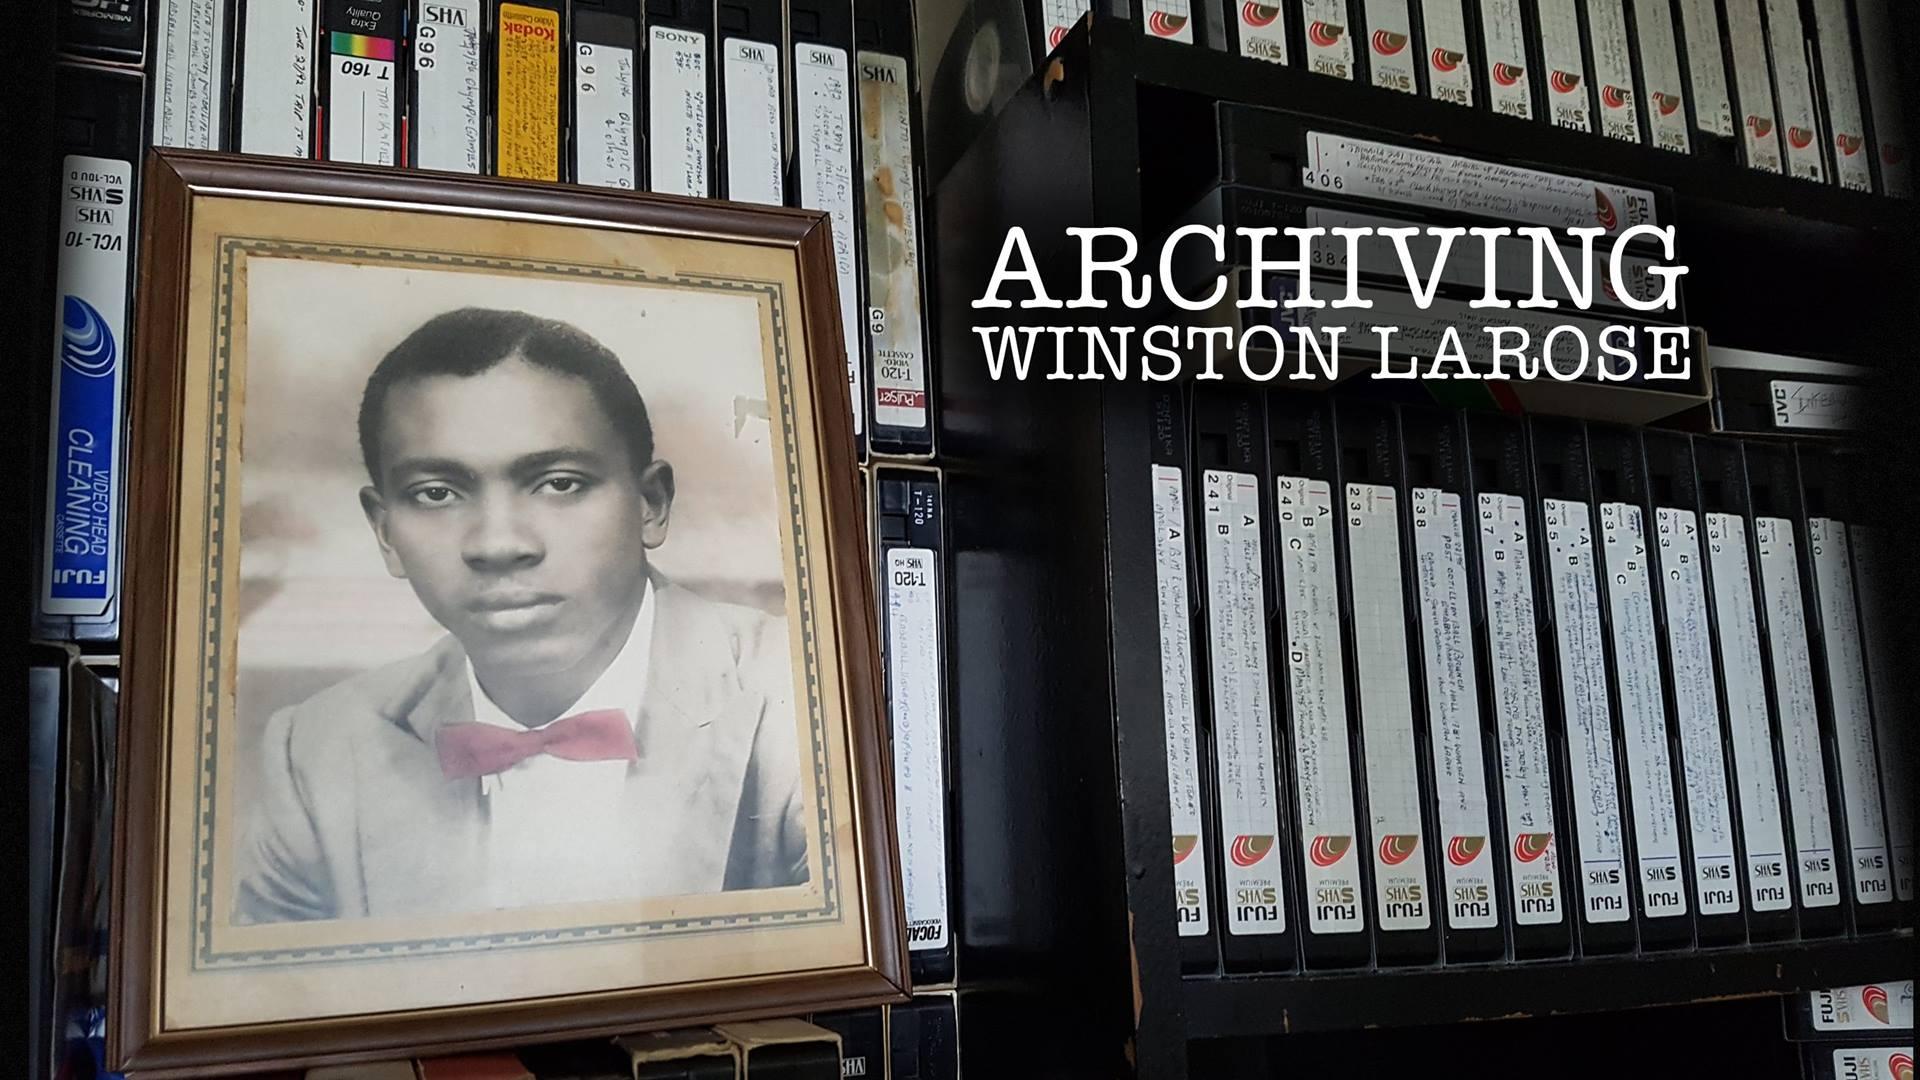 Archiving Winston LaRose